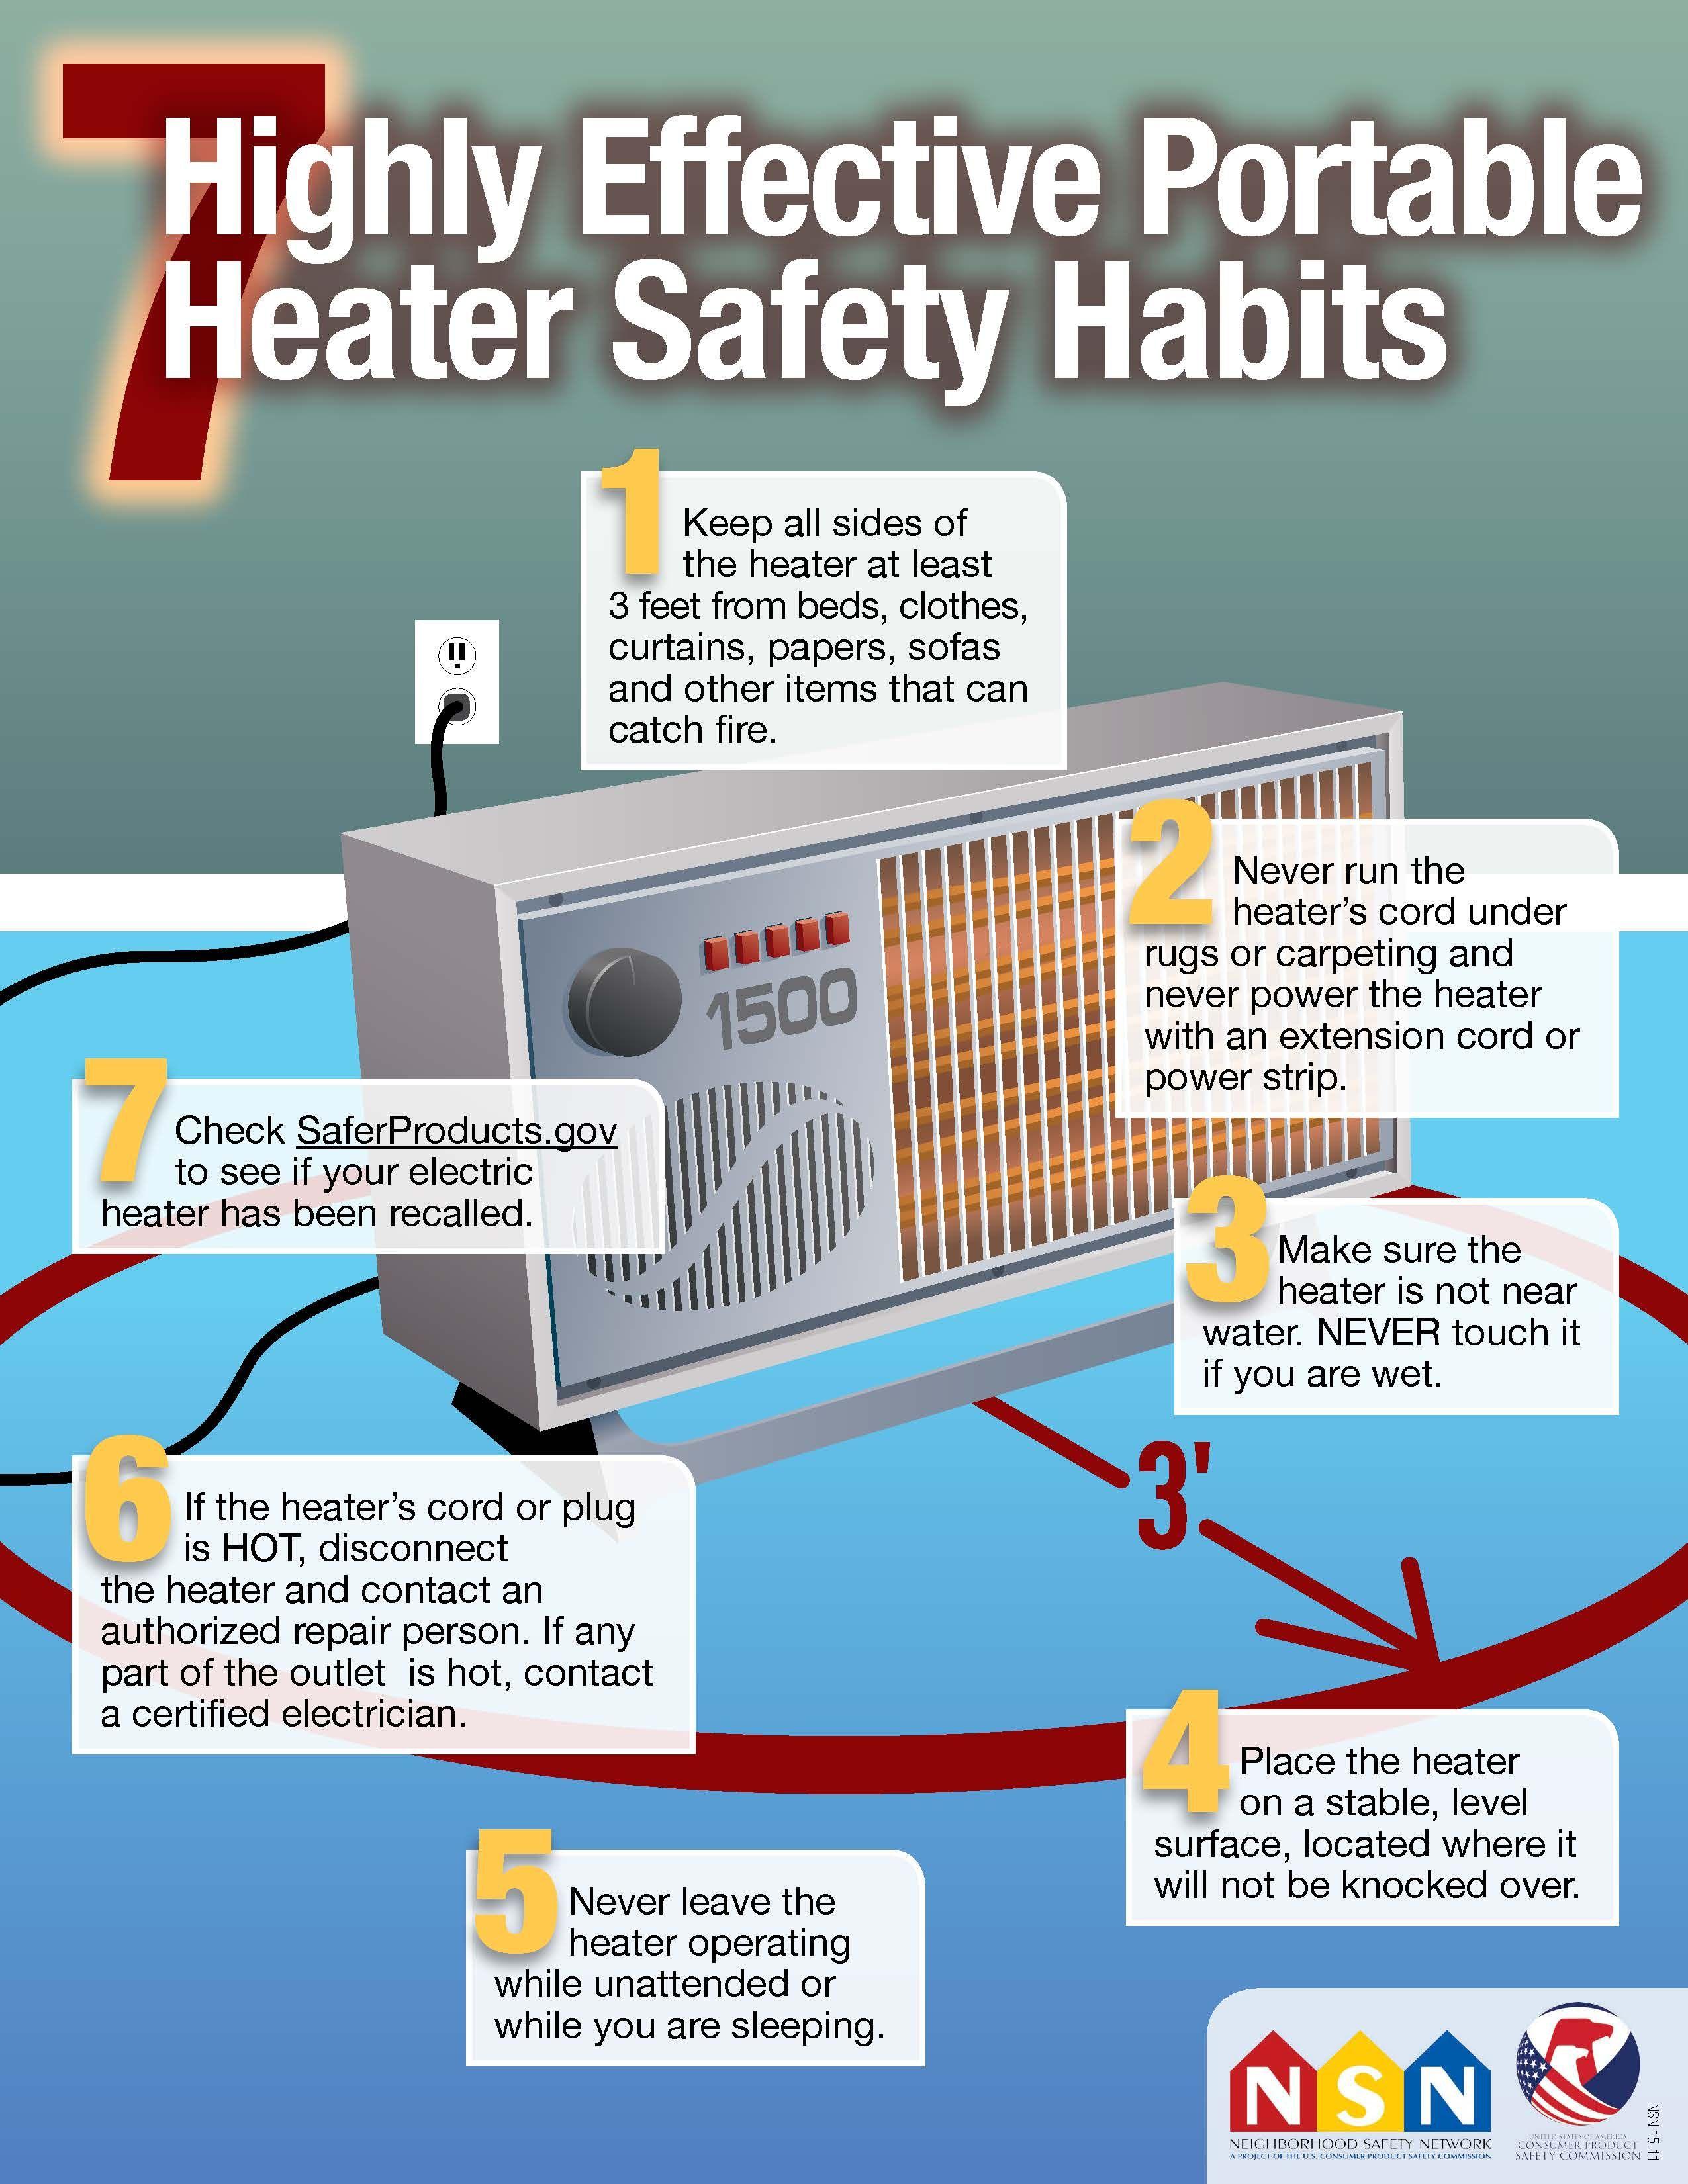 SierraMechanical OFallonMO Home Heaters Safety